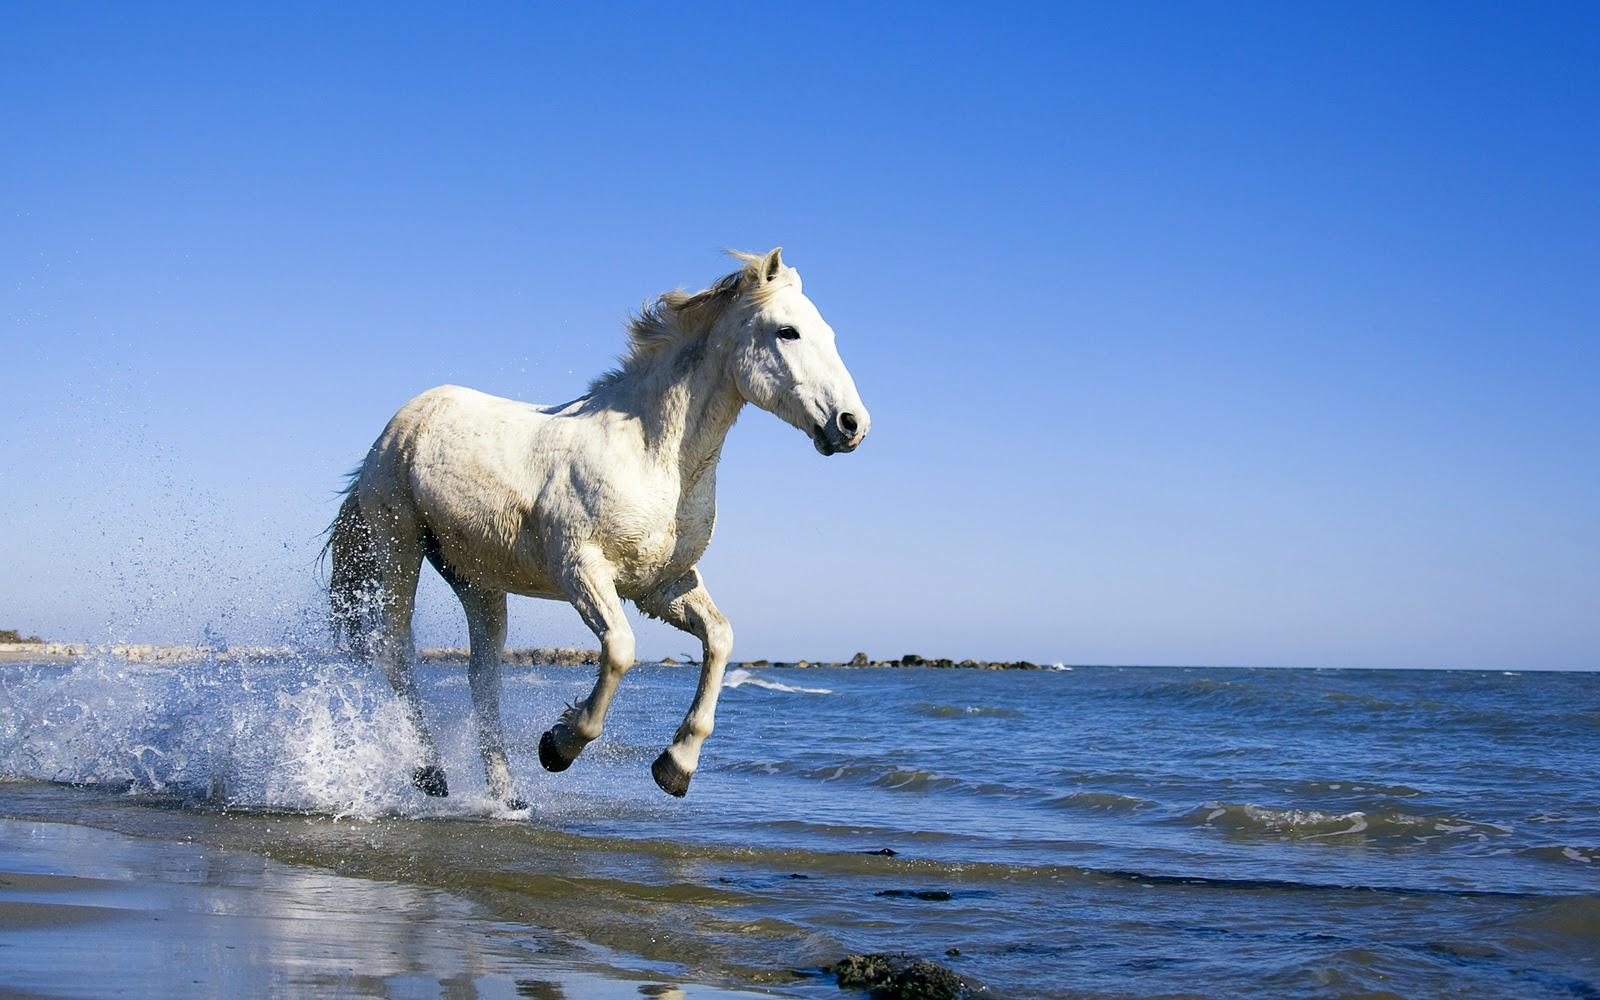 Simple   Wallpaper Horse Ultra Hd - Horses+Wallpapers+1920x1200  Image_628821.jpg